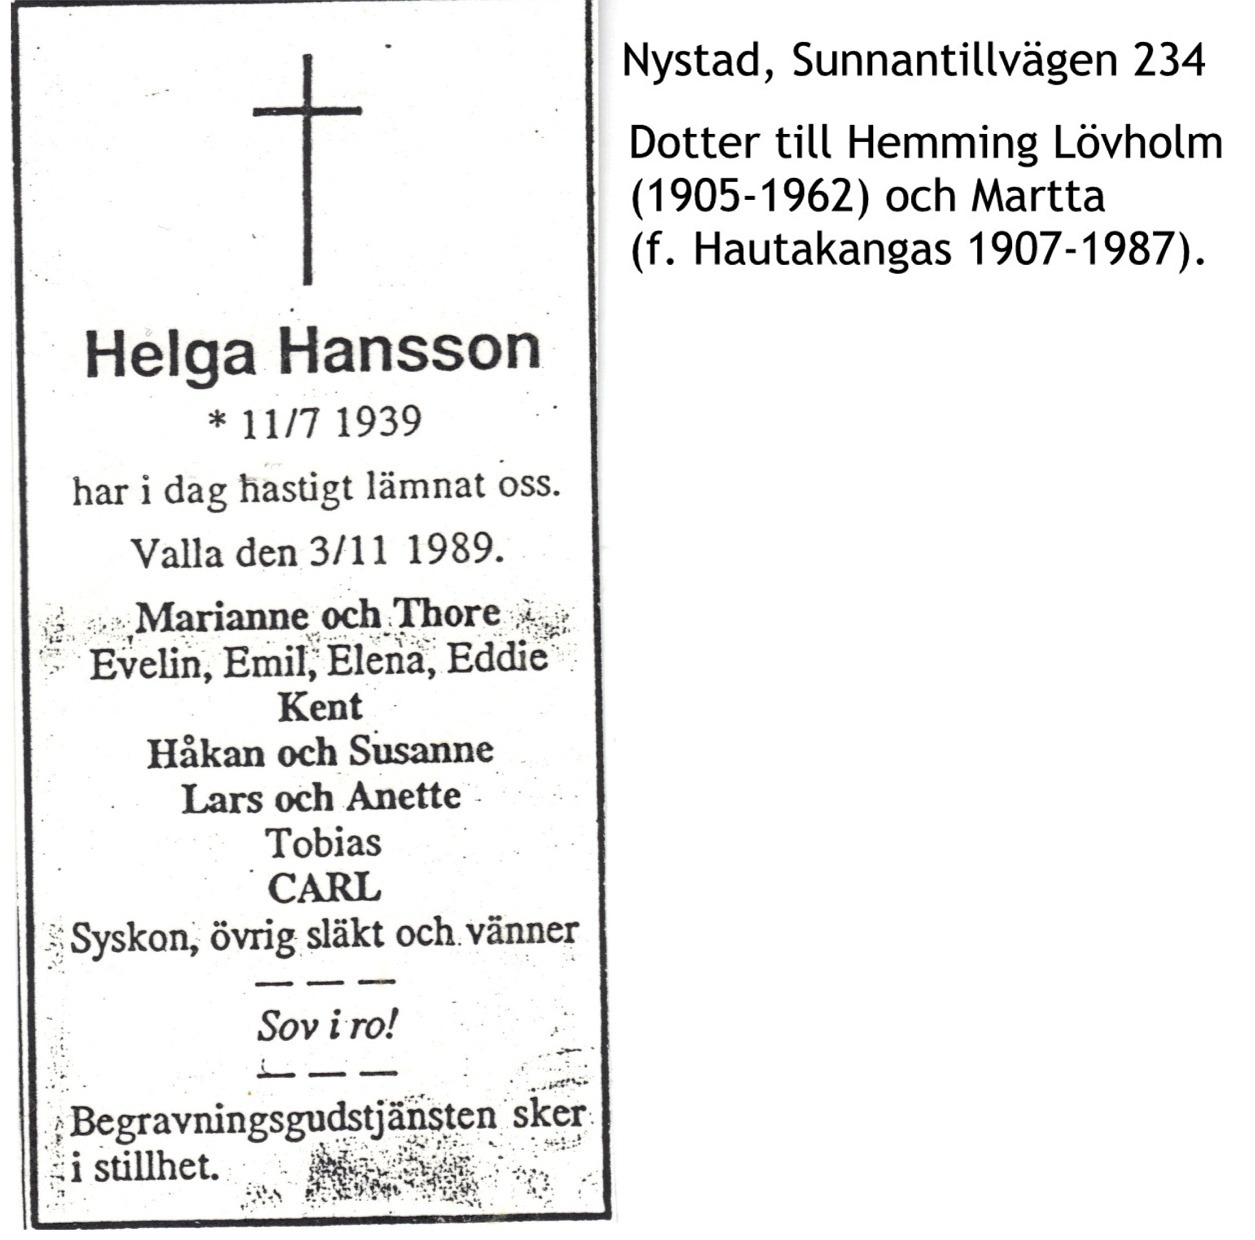 Hansson Helga